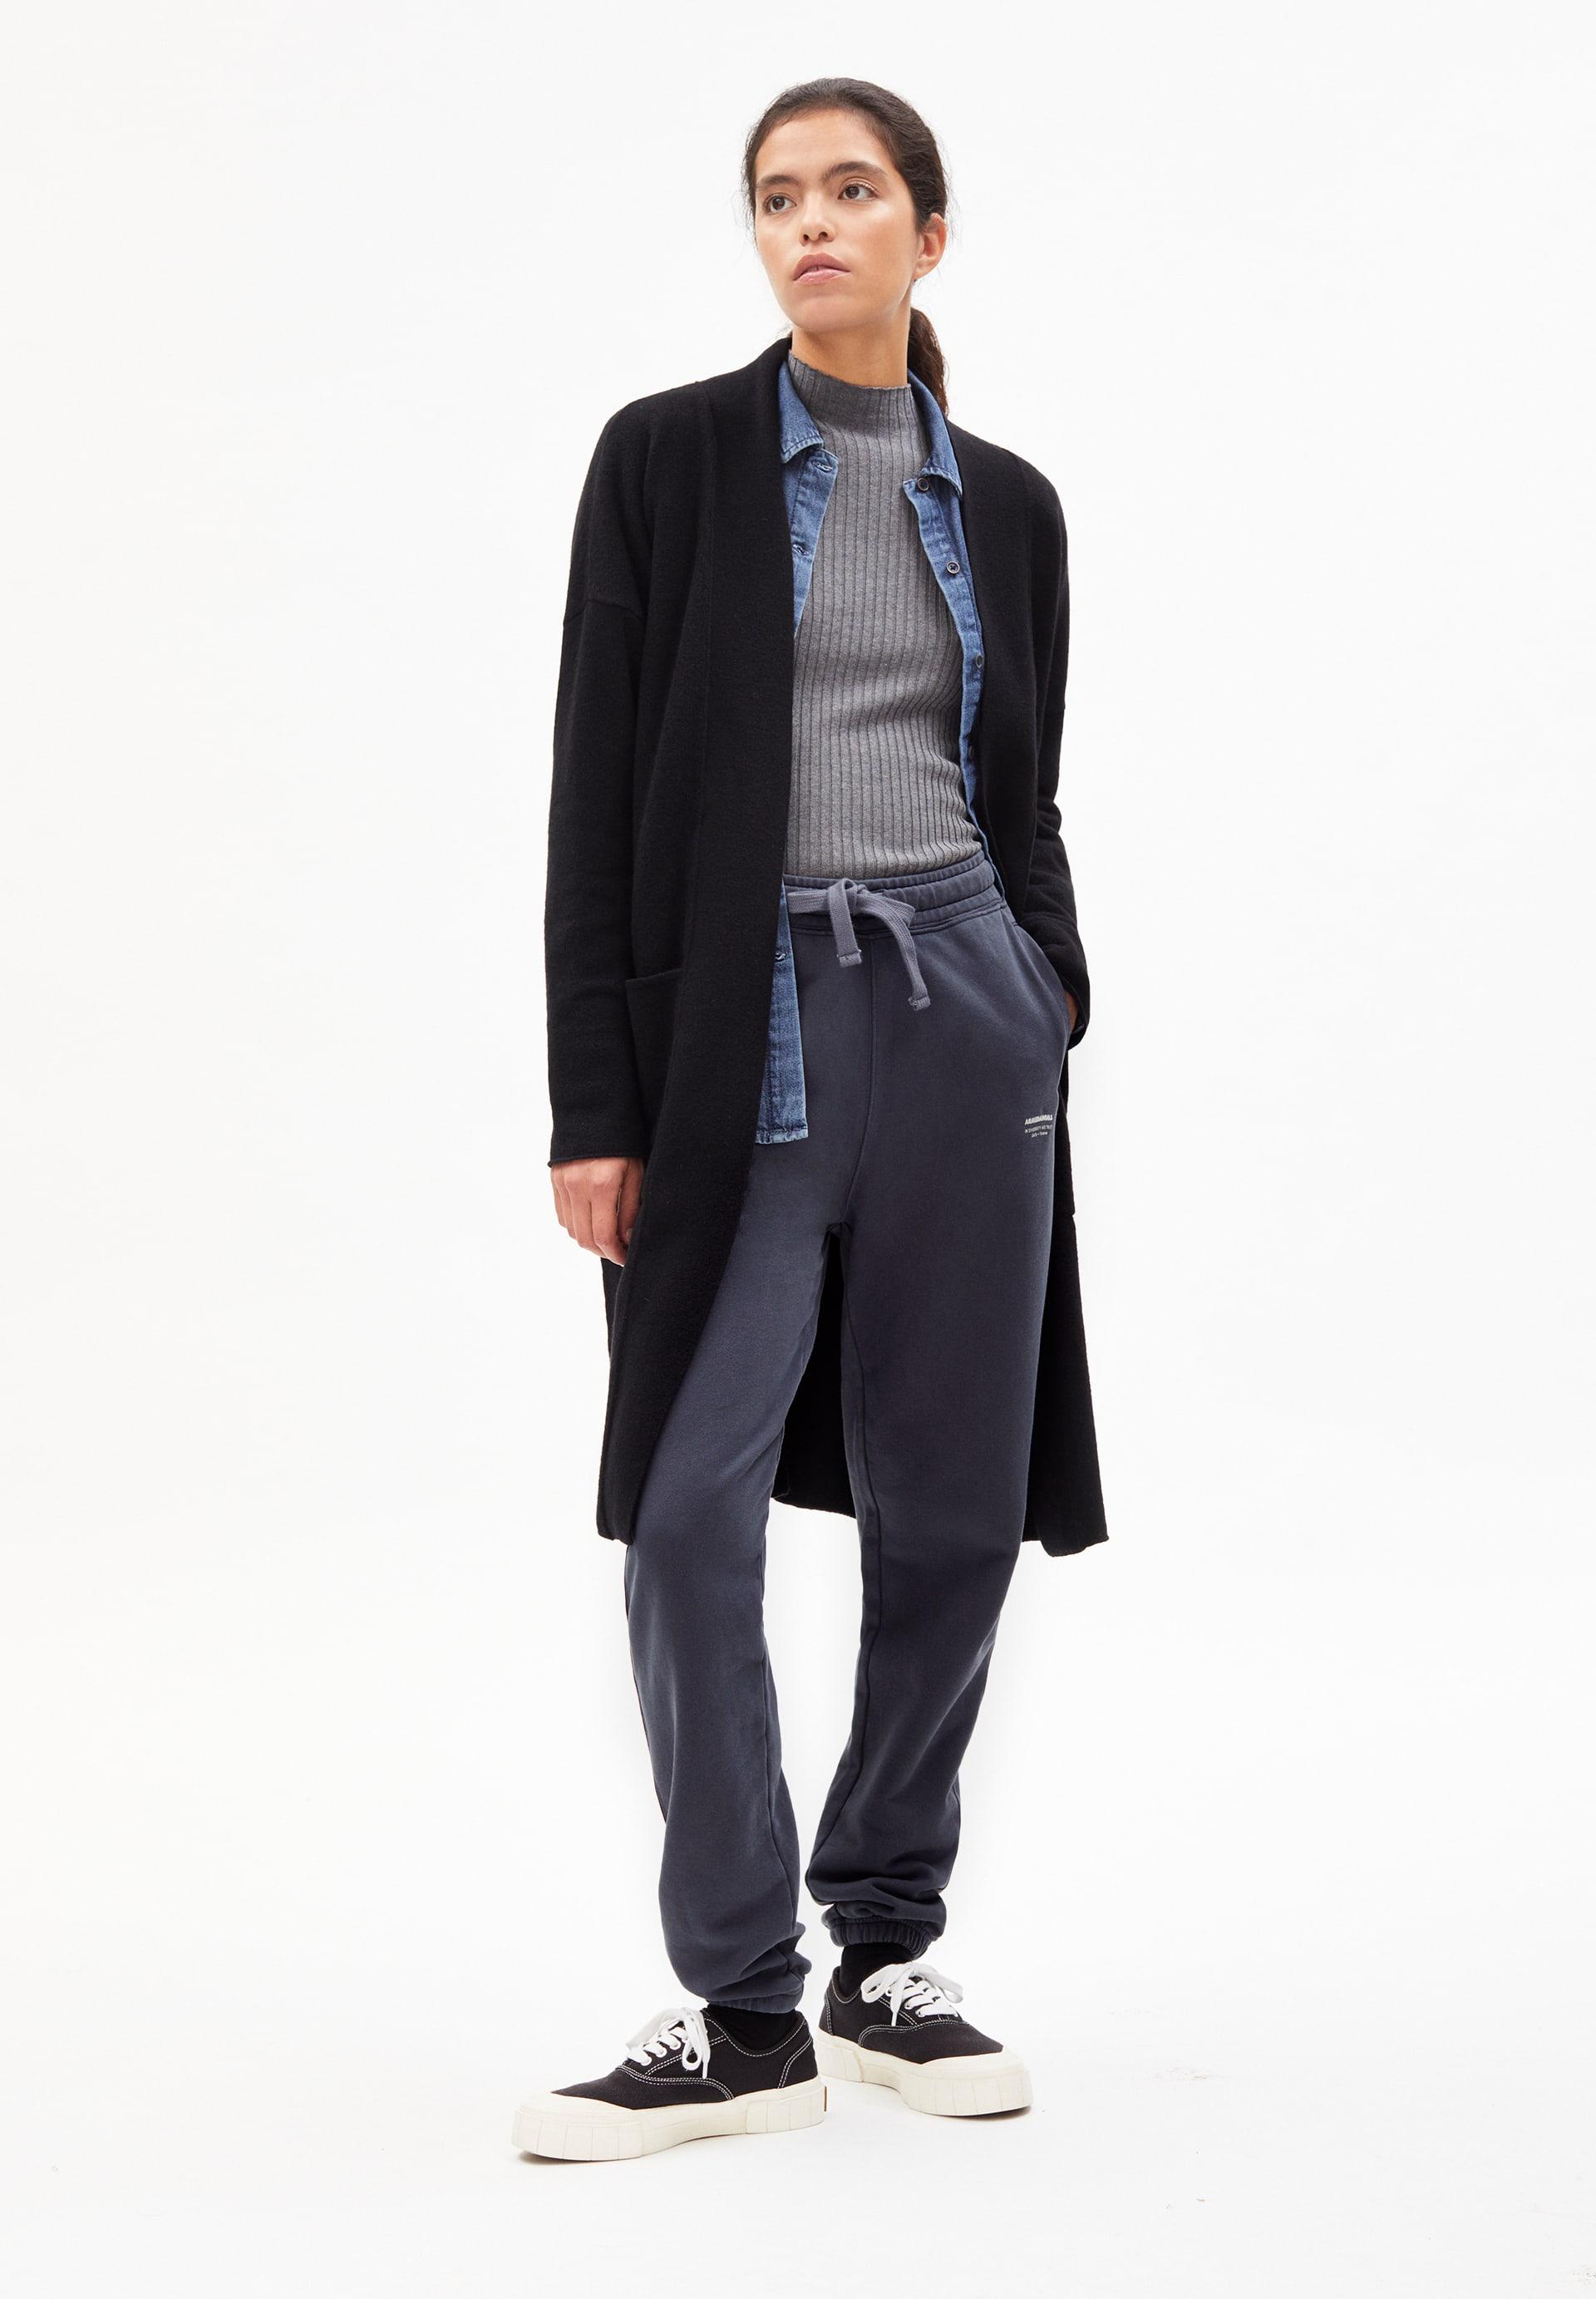 LAONAA RECYCLED WOOL Cardigan en laine biologique mélangée